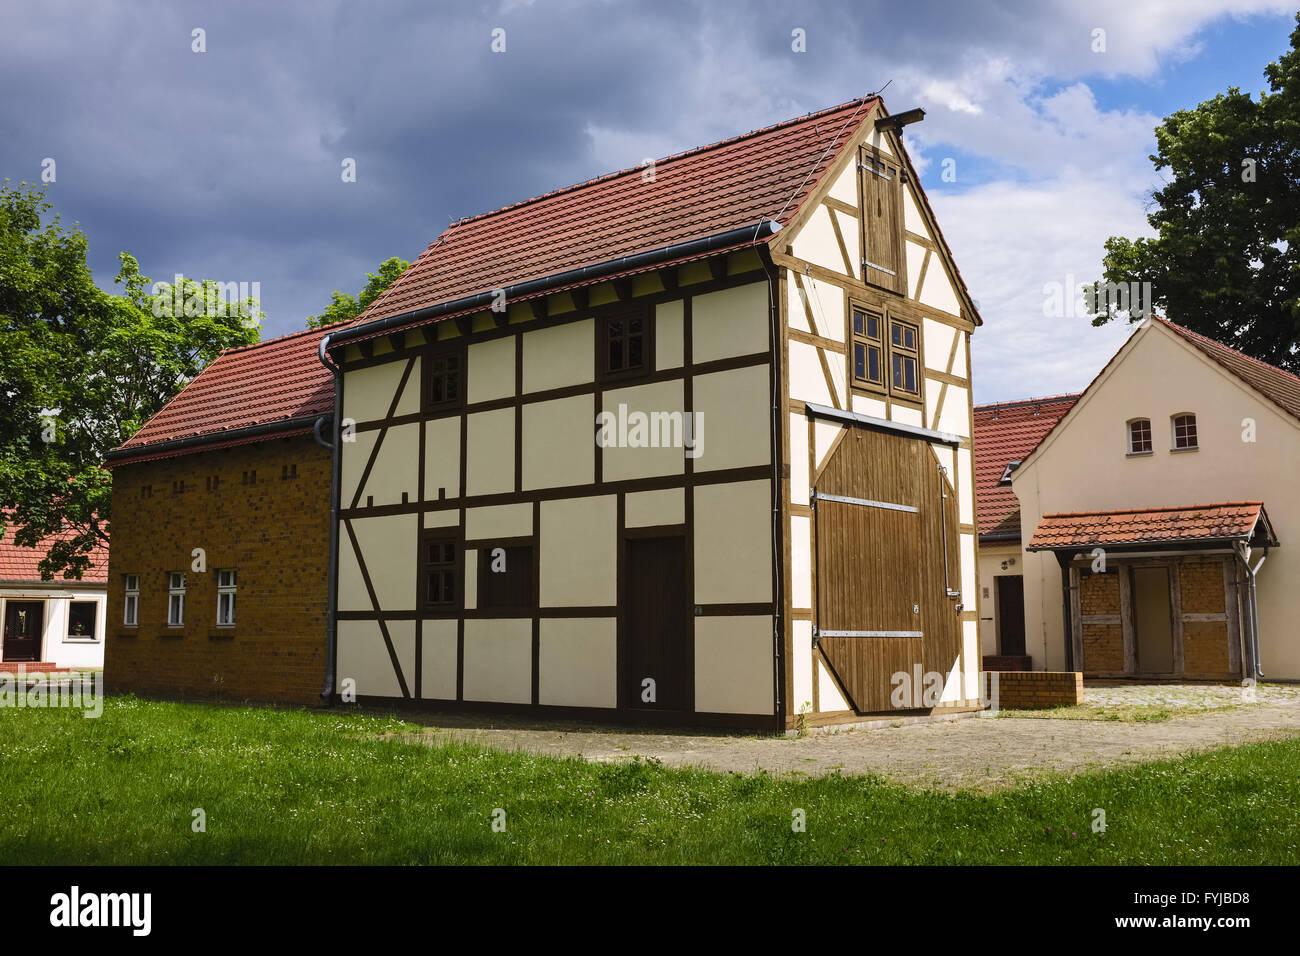 Windmill in a barn, Saalow, Brandenburg, Germany - Stock Image